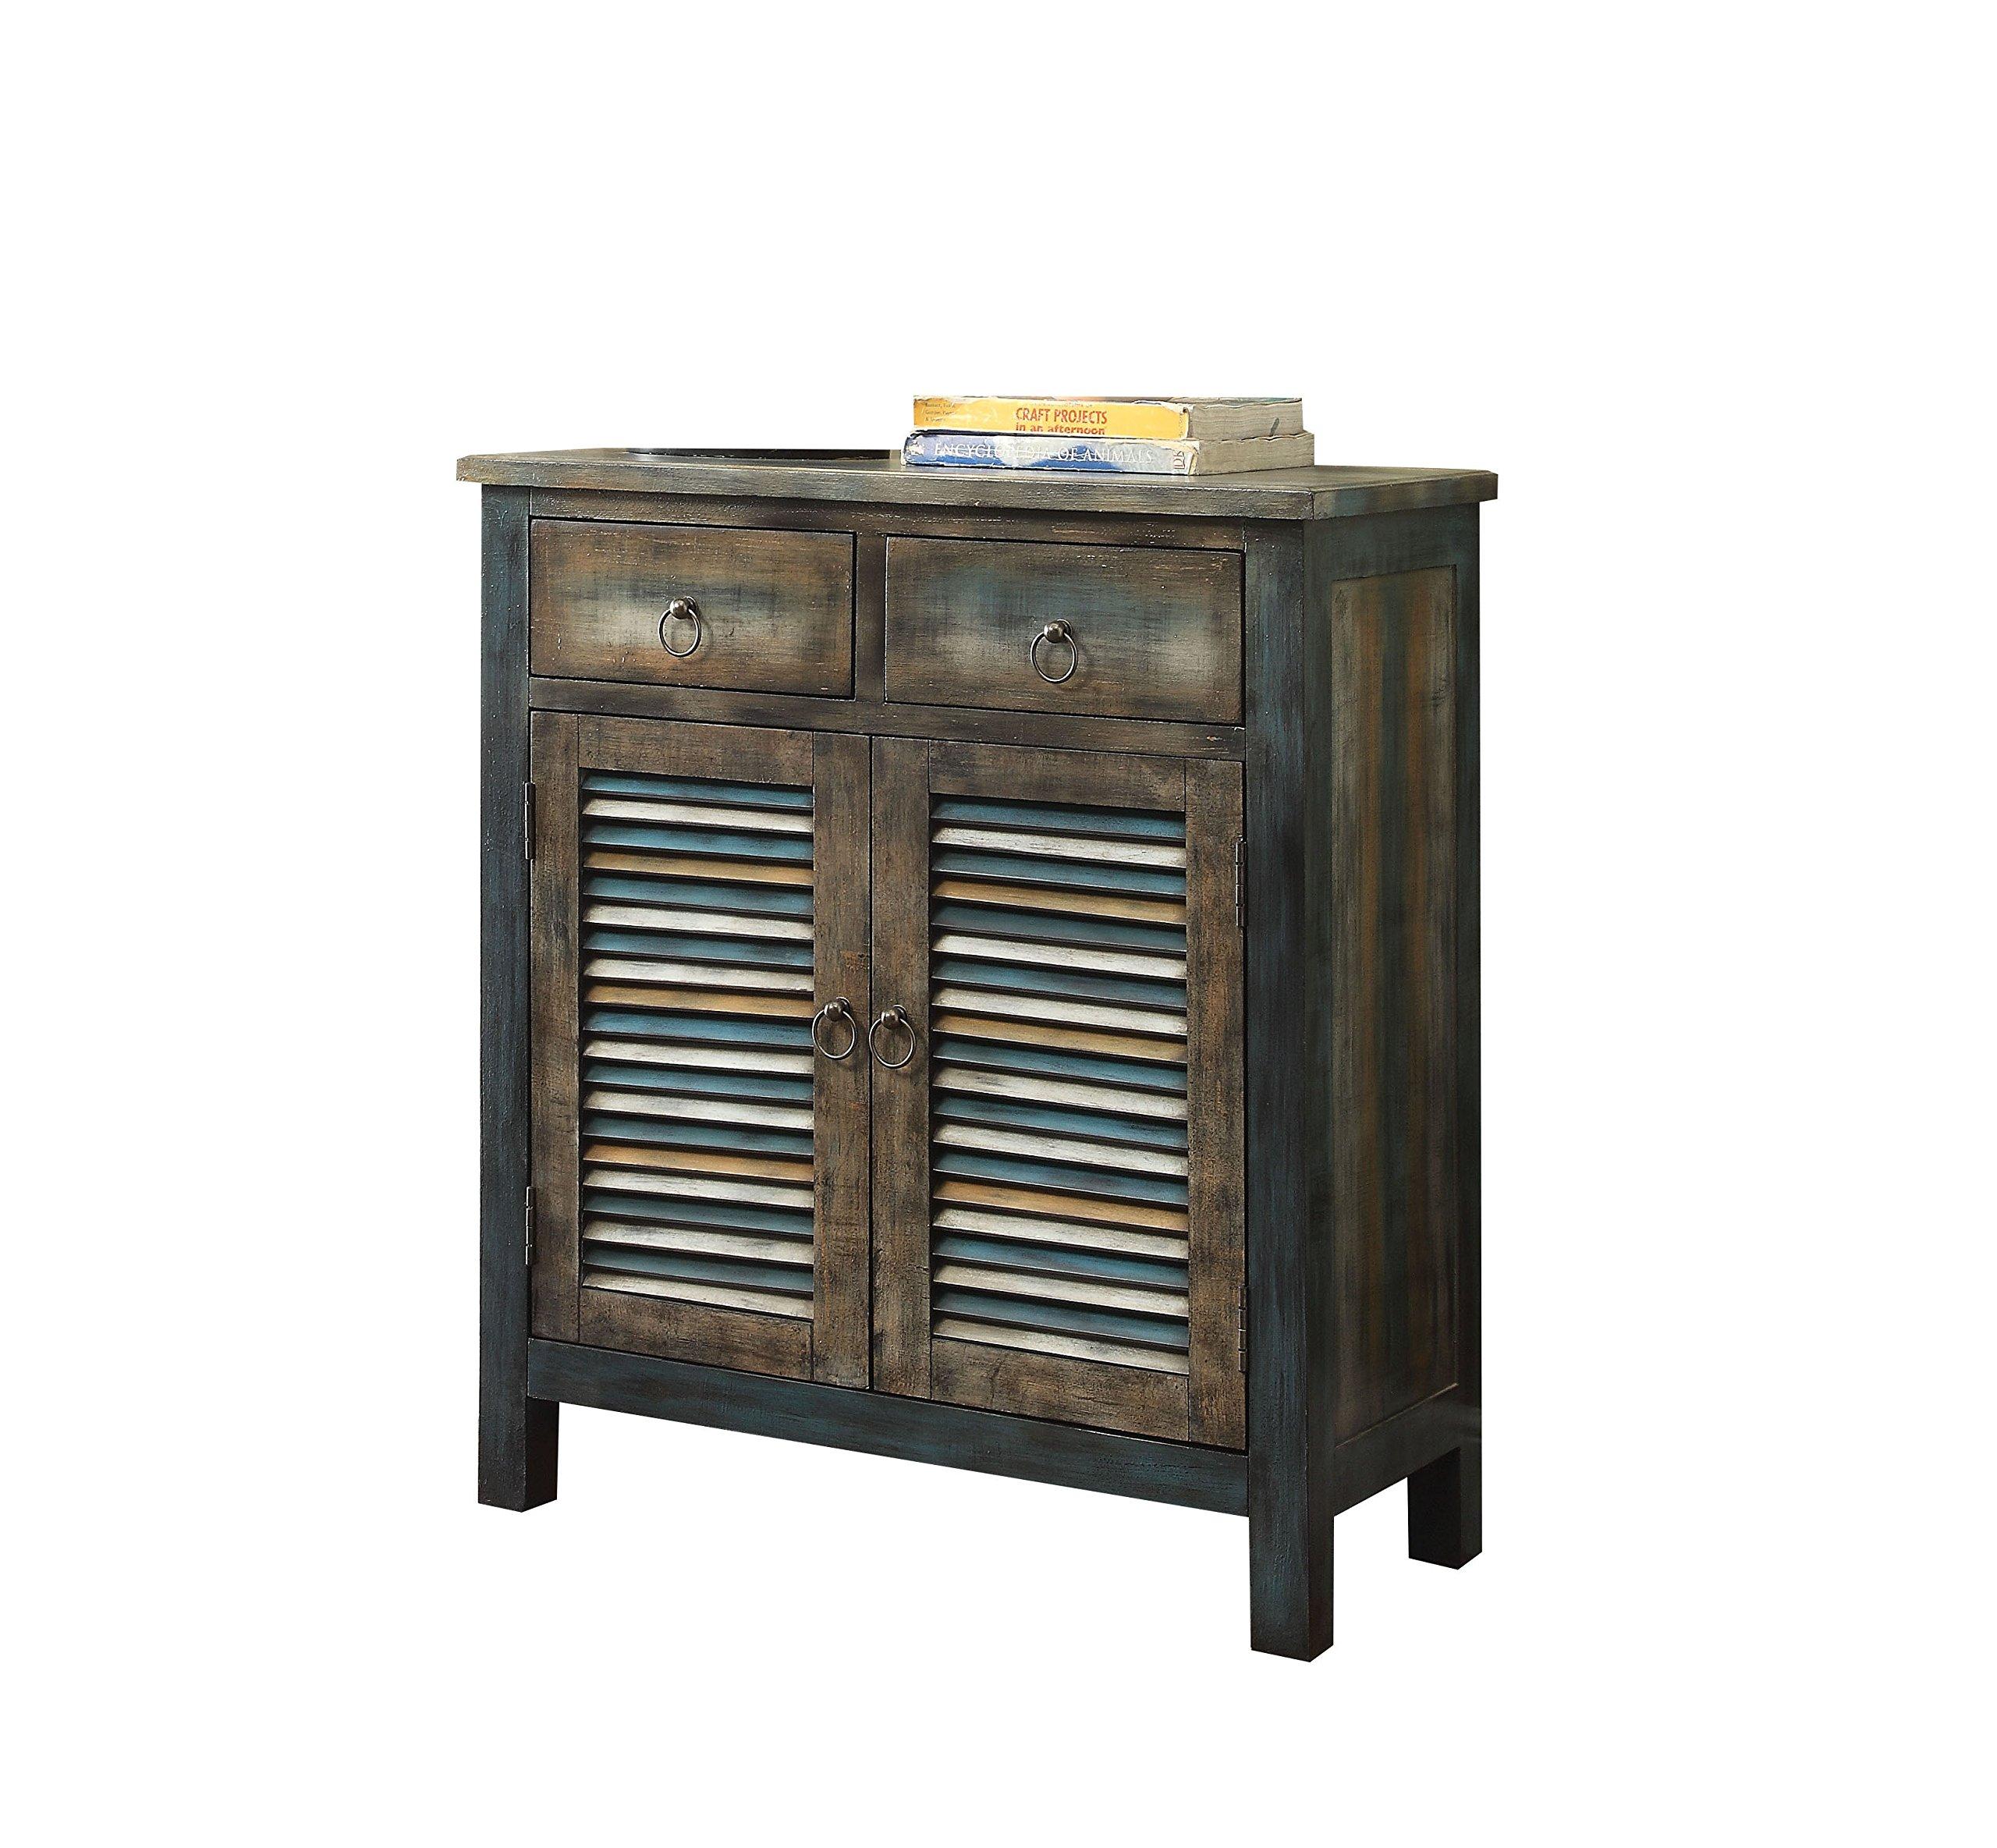 ACME Glancio Antique Oak and Teal Console Table